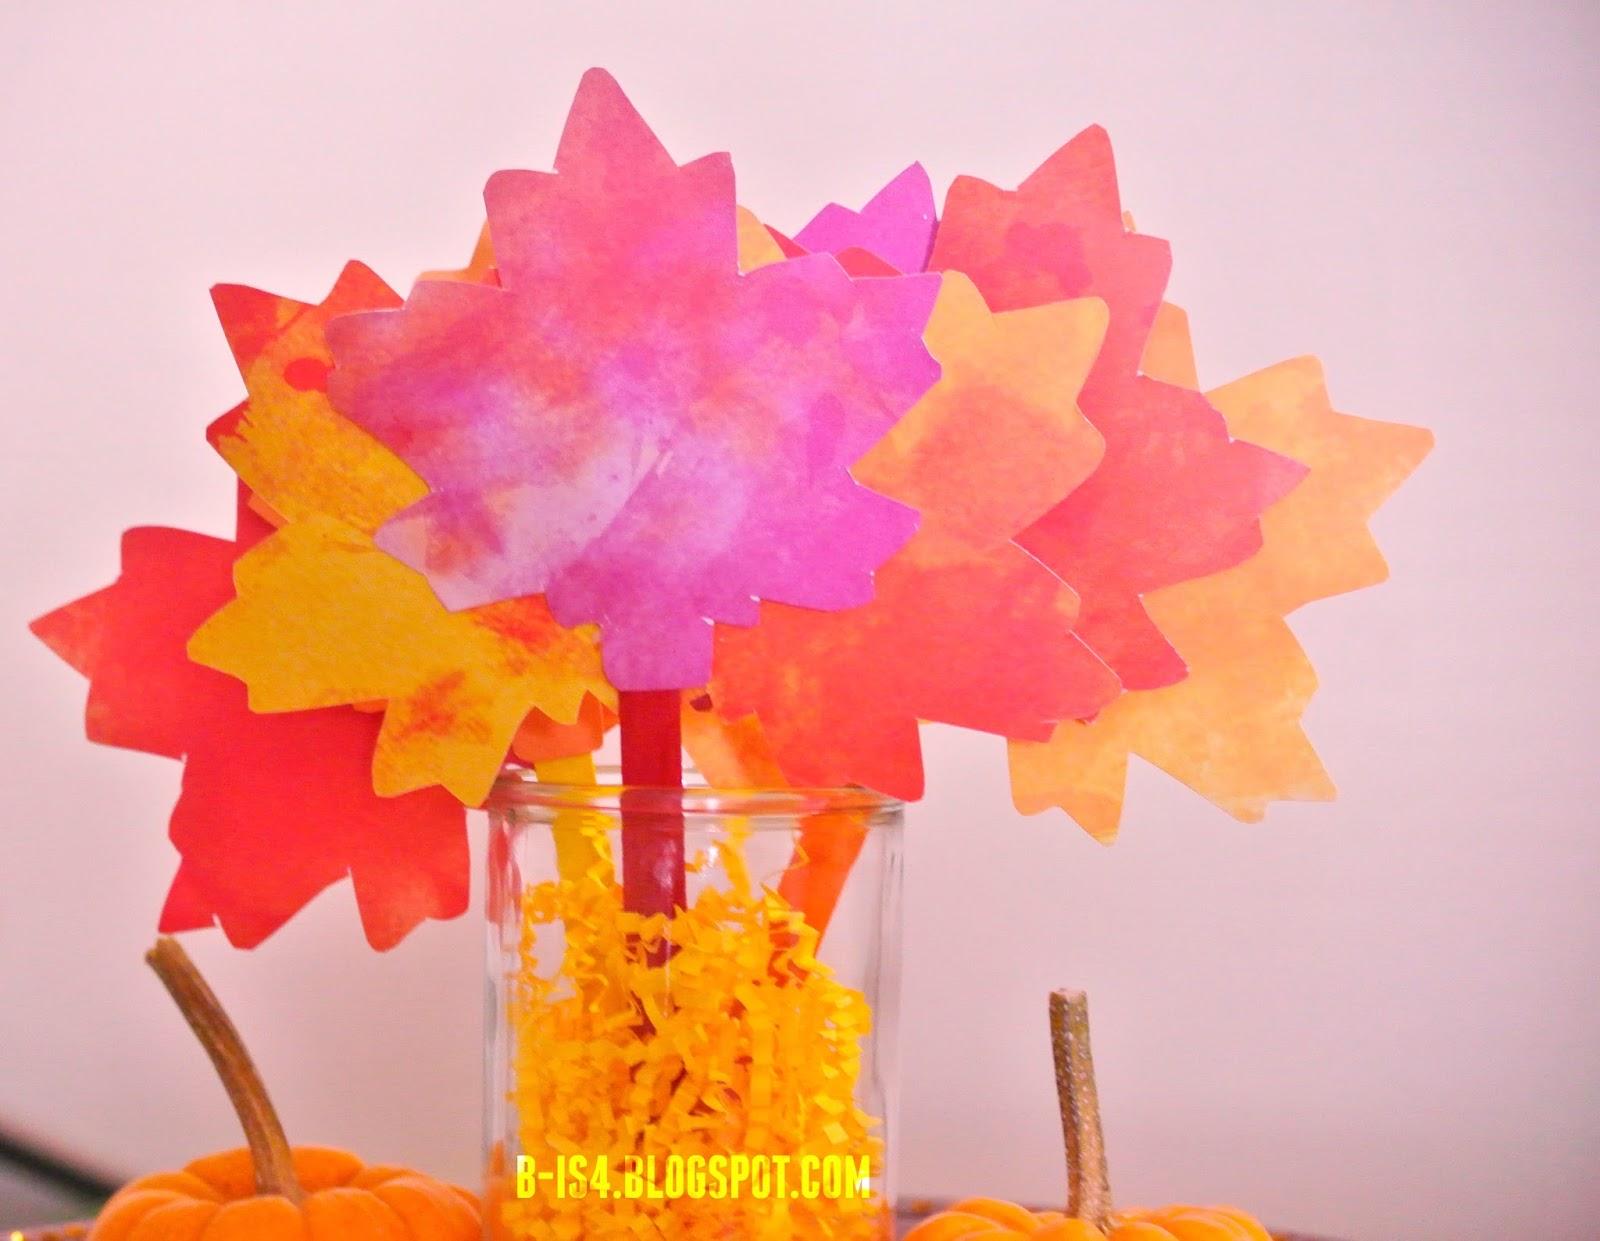 Diy thanksgiving paper decor - Thanksgiving Paper Leaves Centerpiece Diy Crafts Table Decor